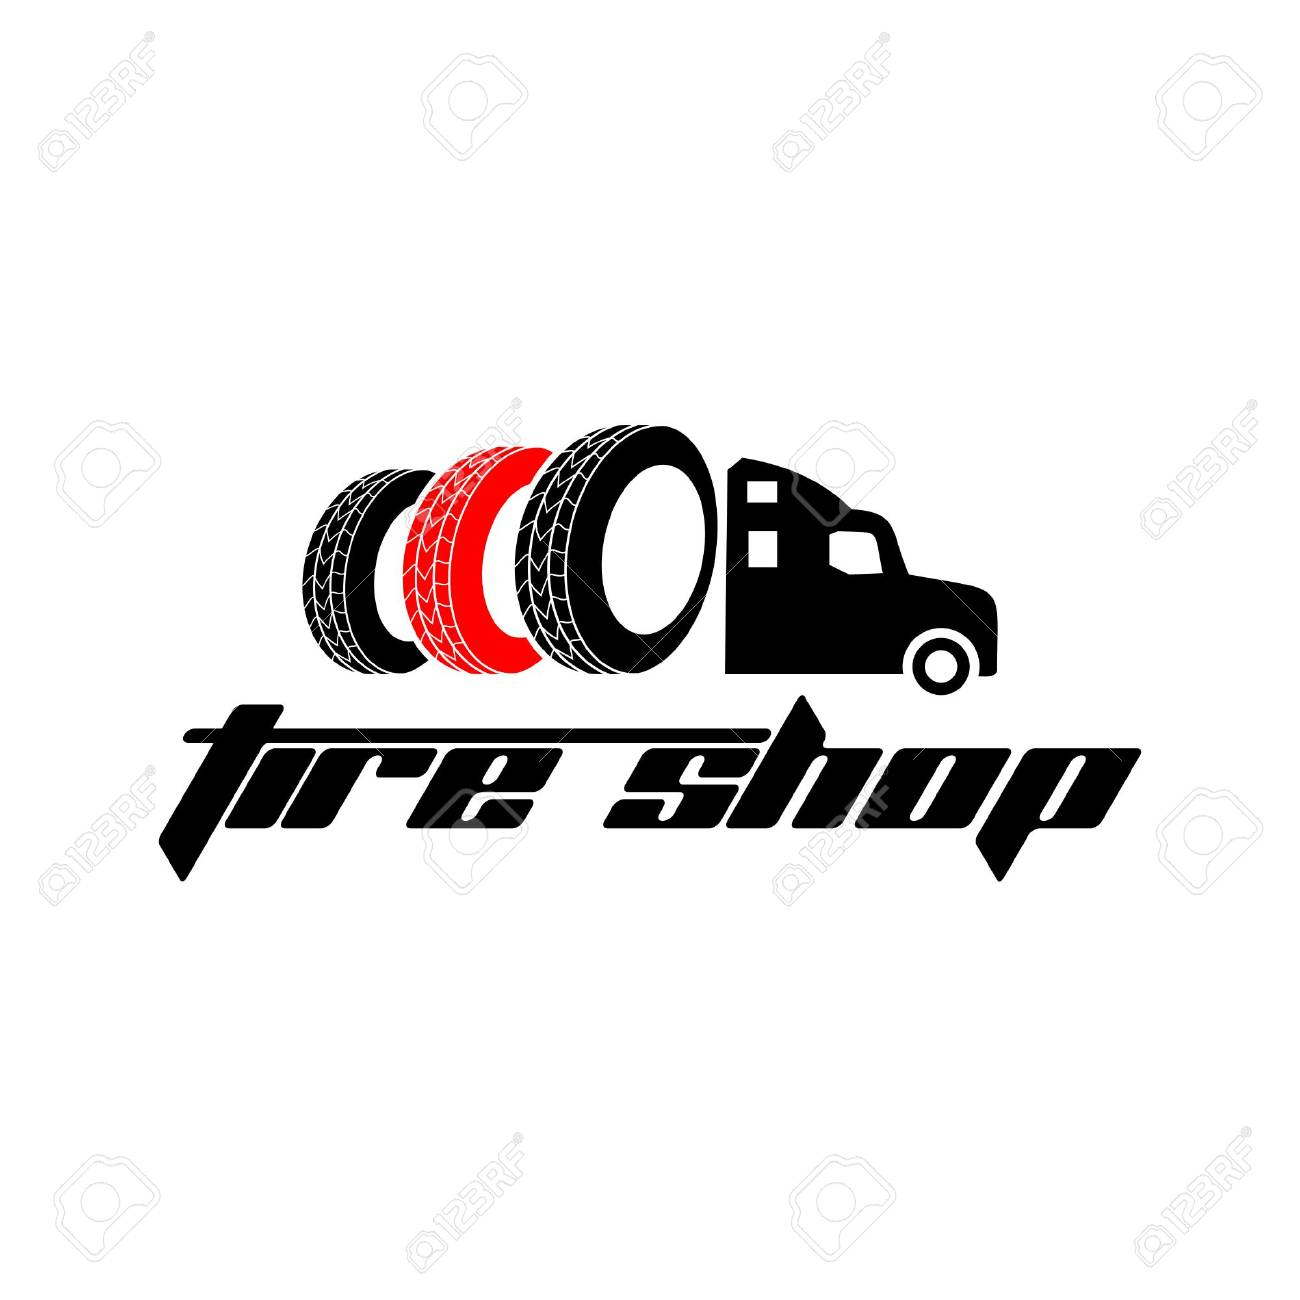 Tyre Shop Logo Design Tyre Business Branding Tyre Logo Shop